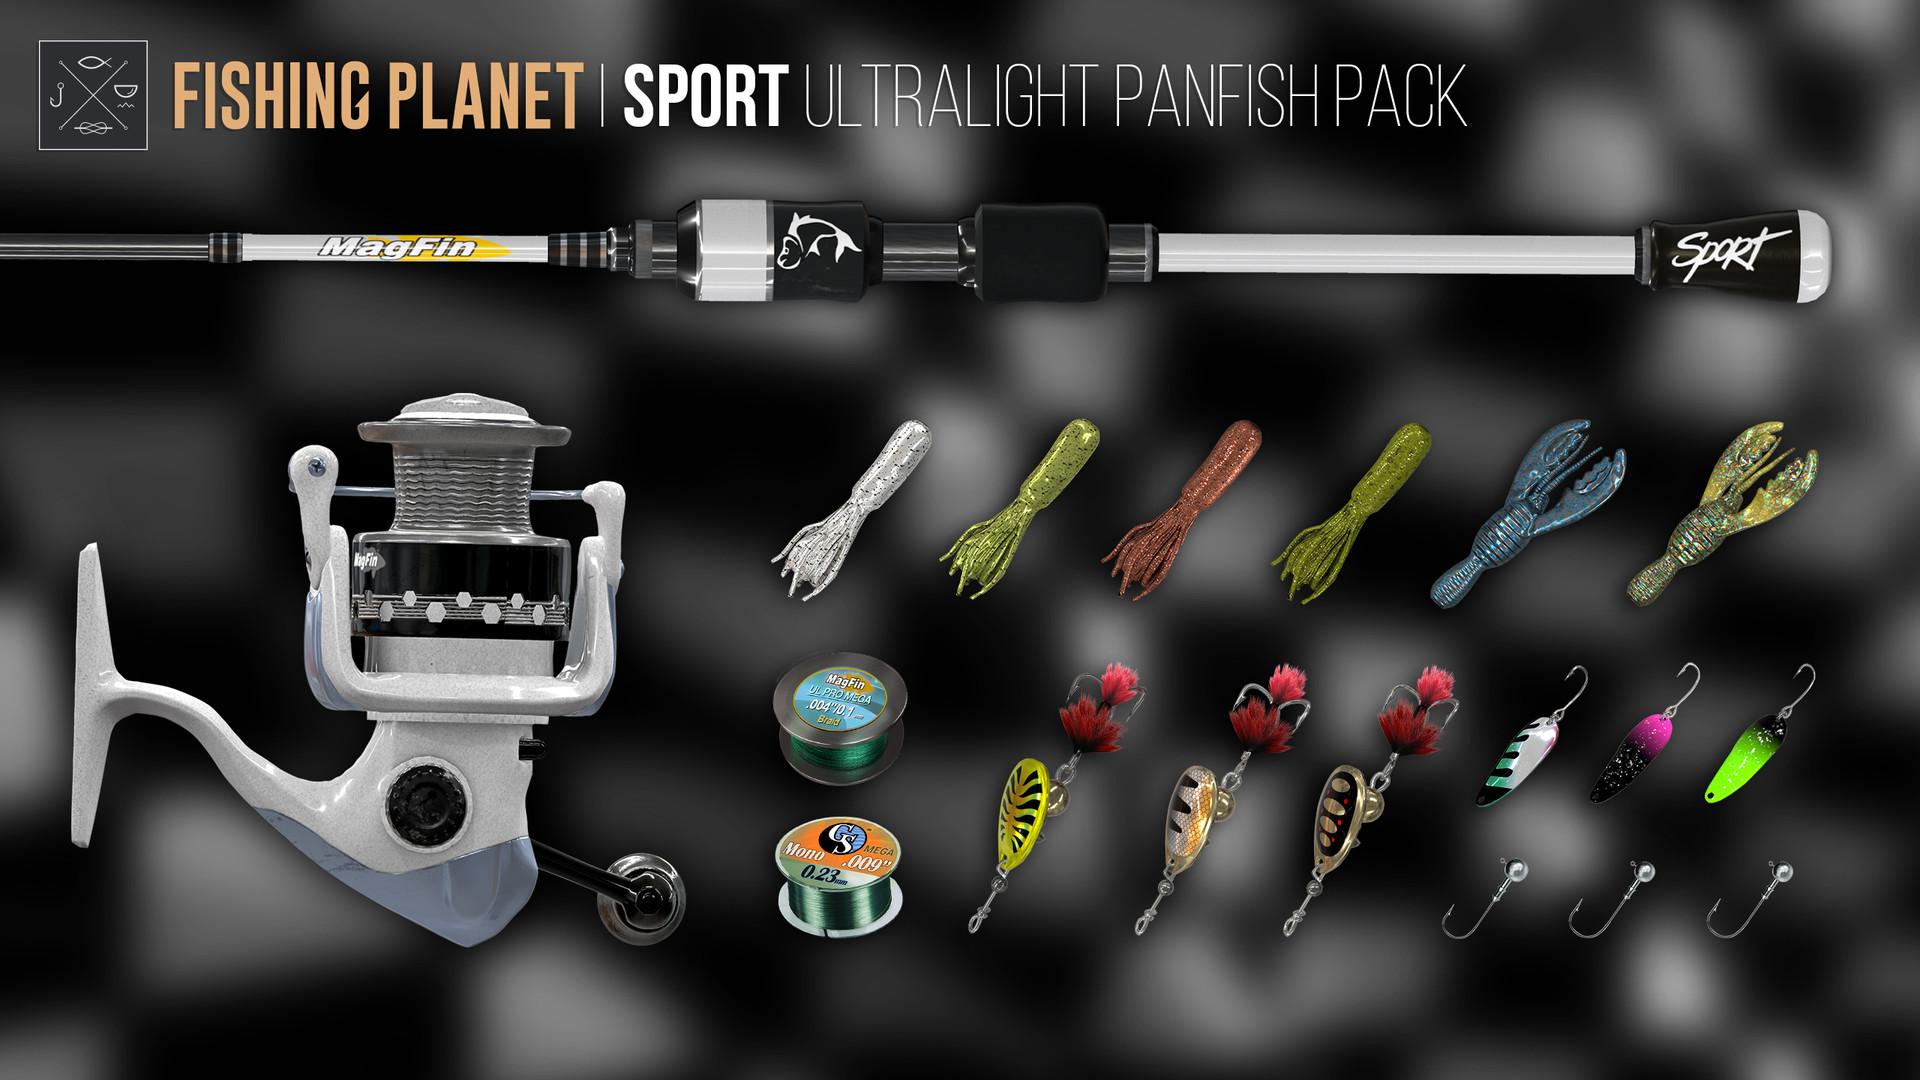 Sport ultralight panfish pack download free pc